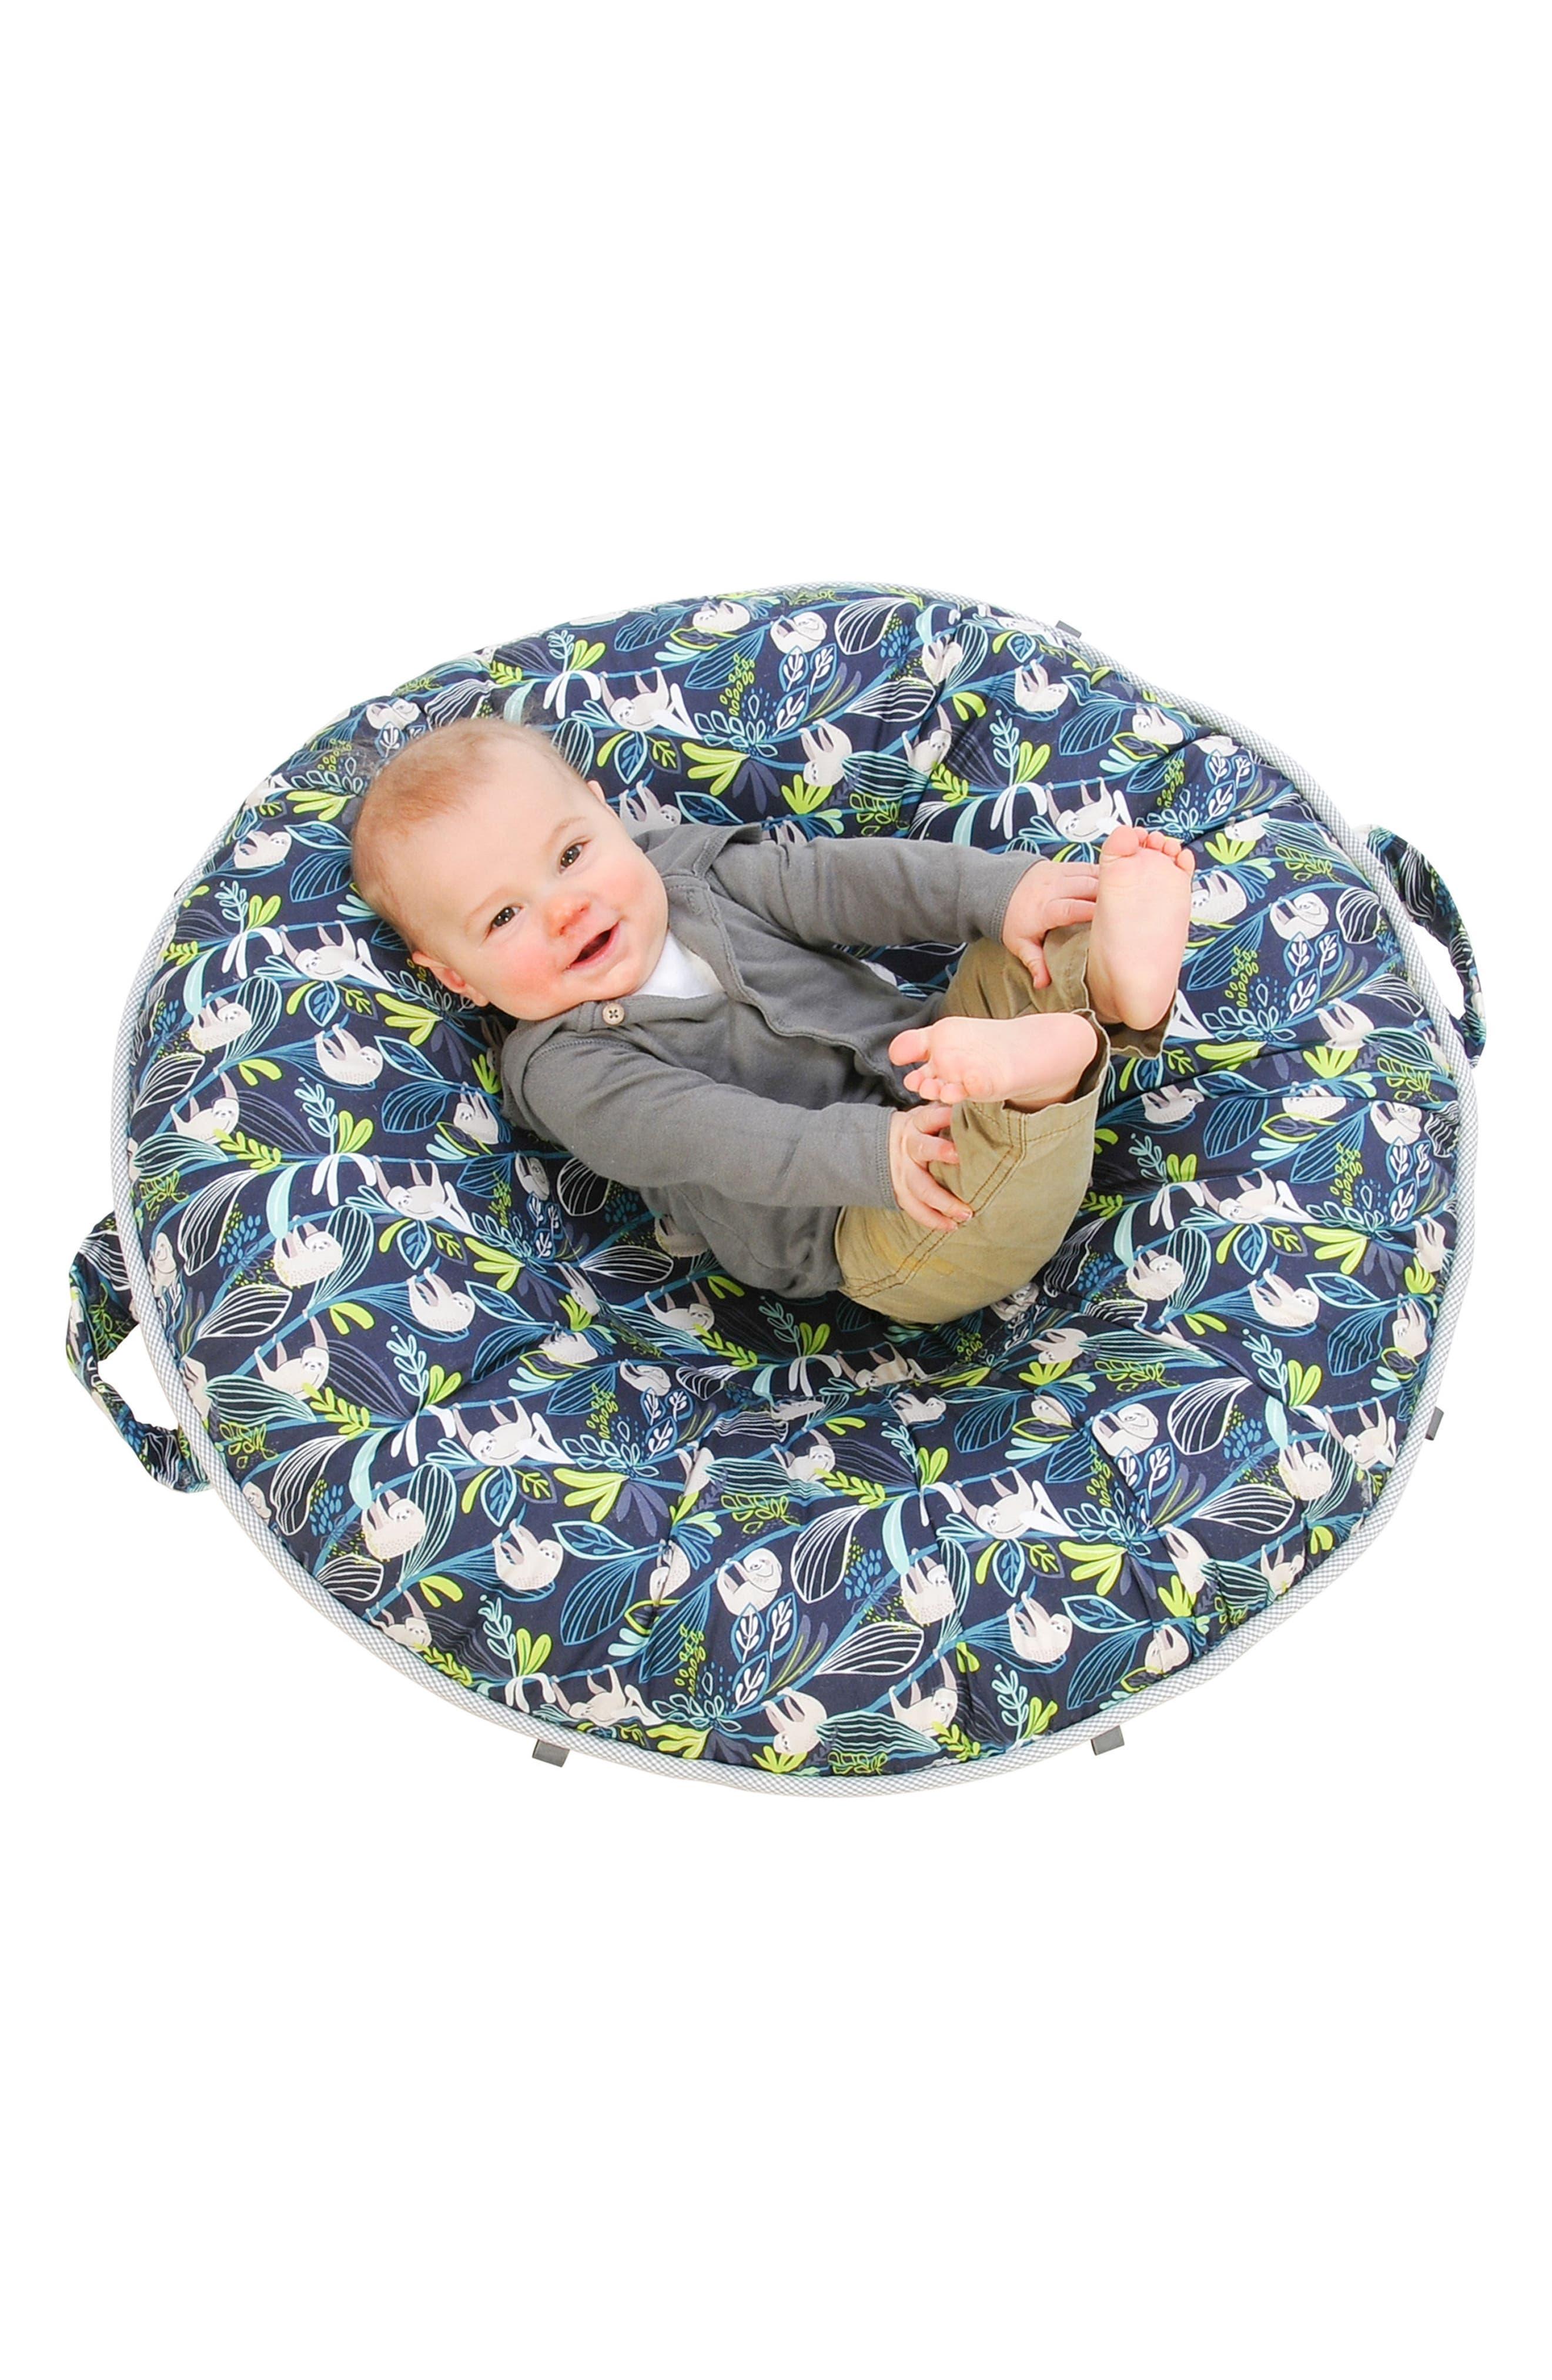 Sammy Luxe Portable Floor Pillow,                             Alternate thumbnail 2, color,                             Blue/ Gray